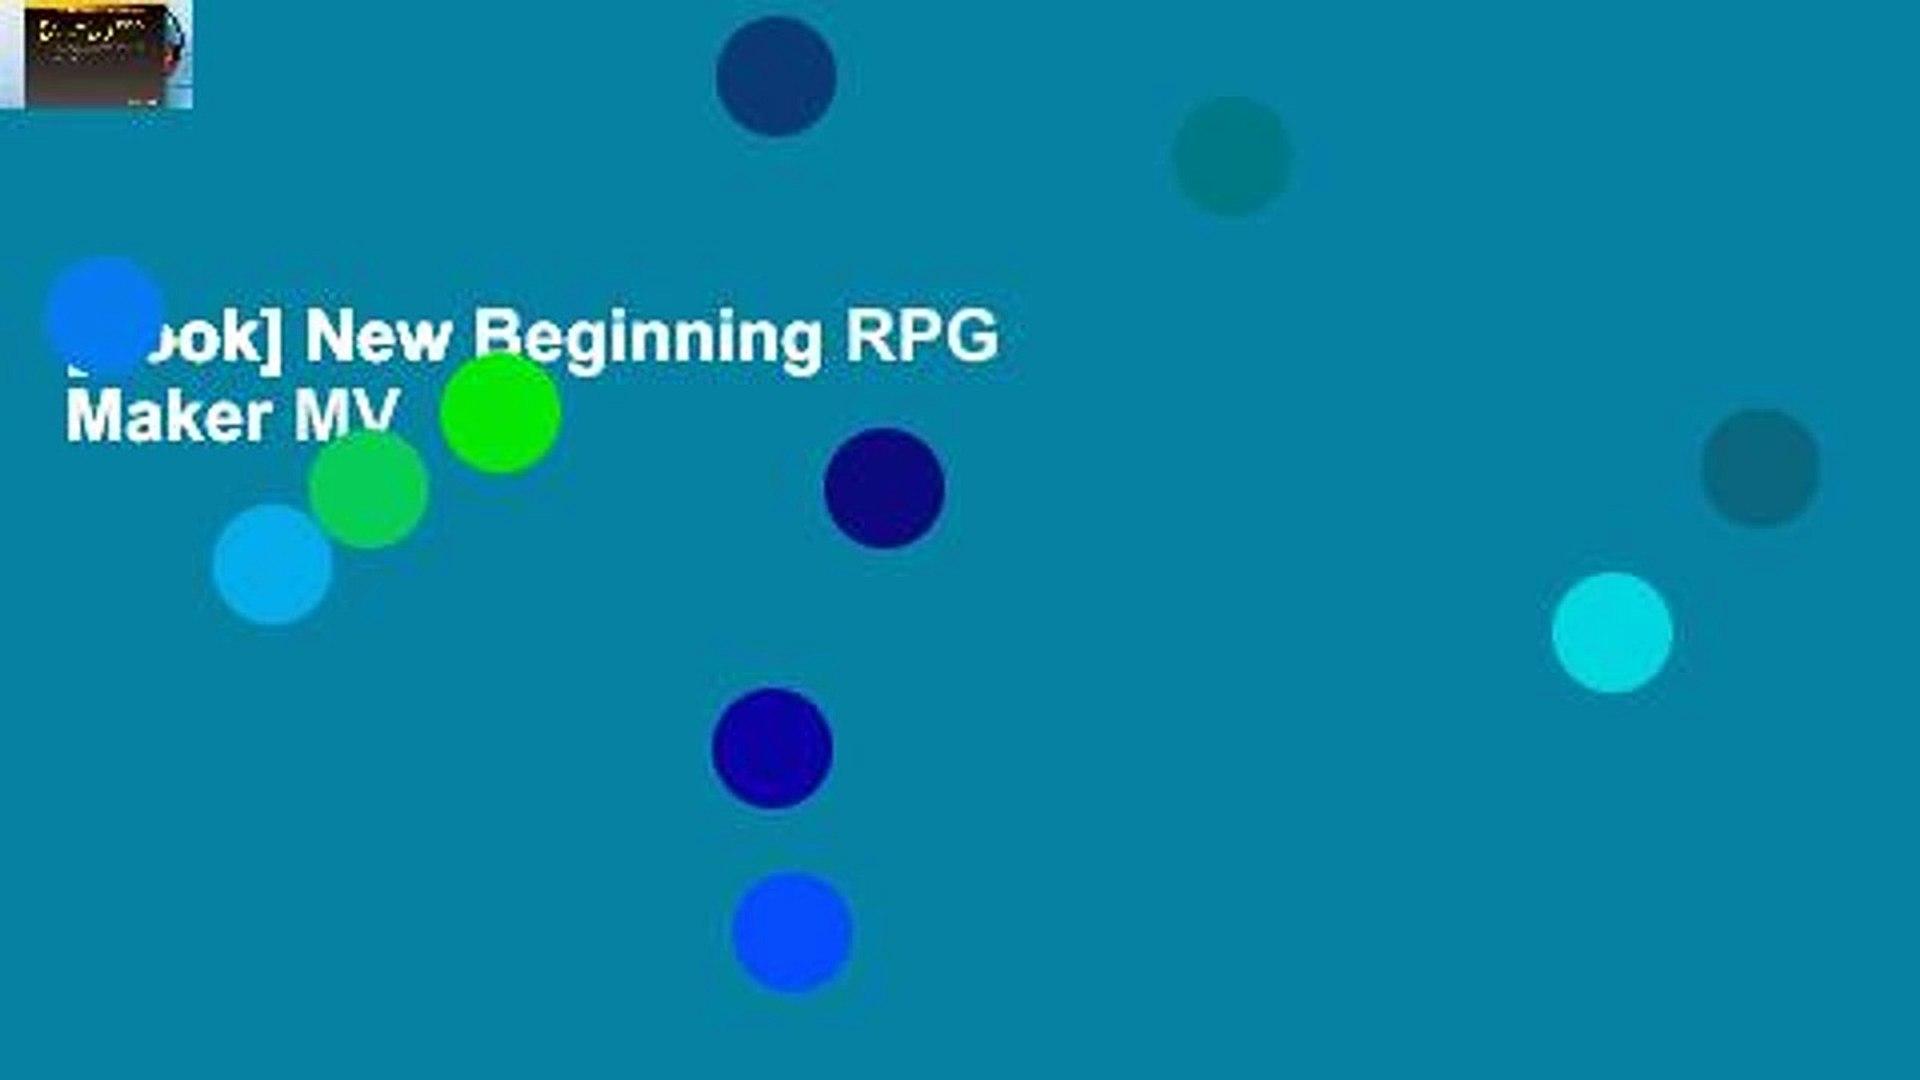 [book] New Beginning RPG Maker MV